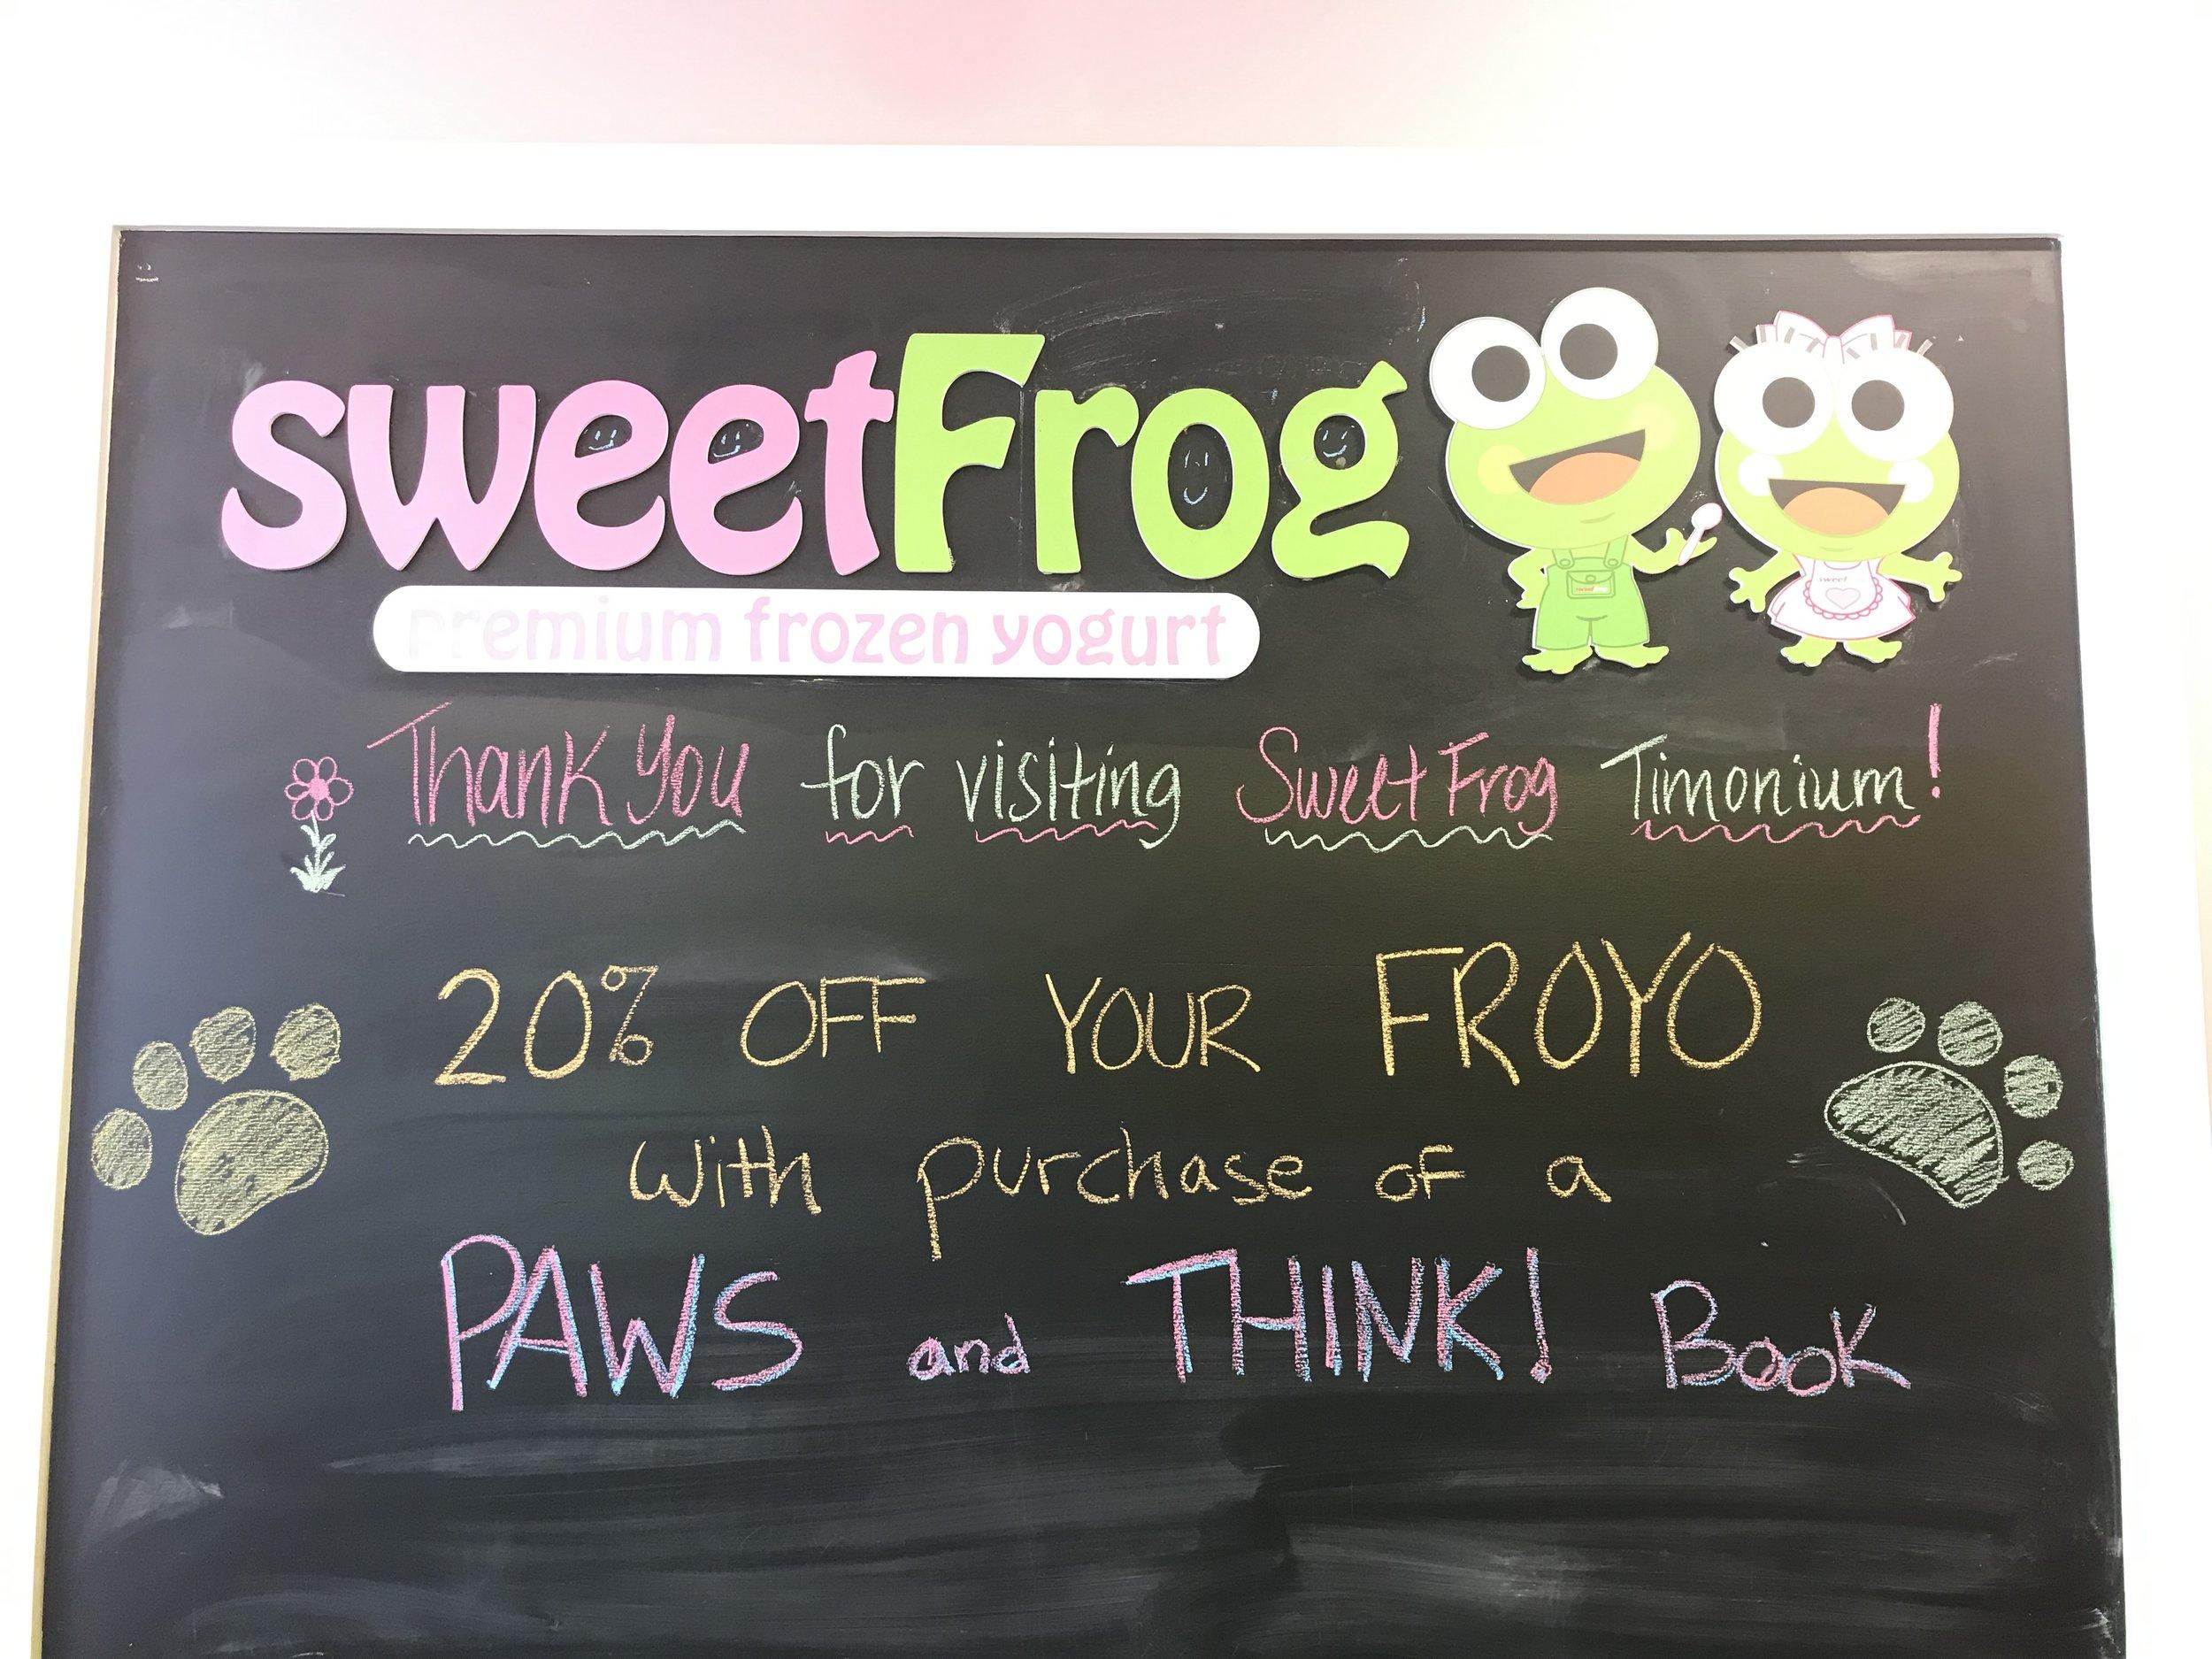 Sweet Frog (Timonium)